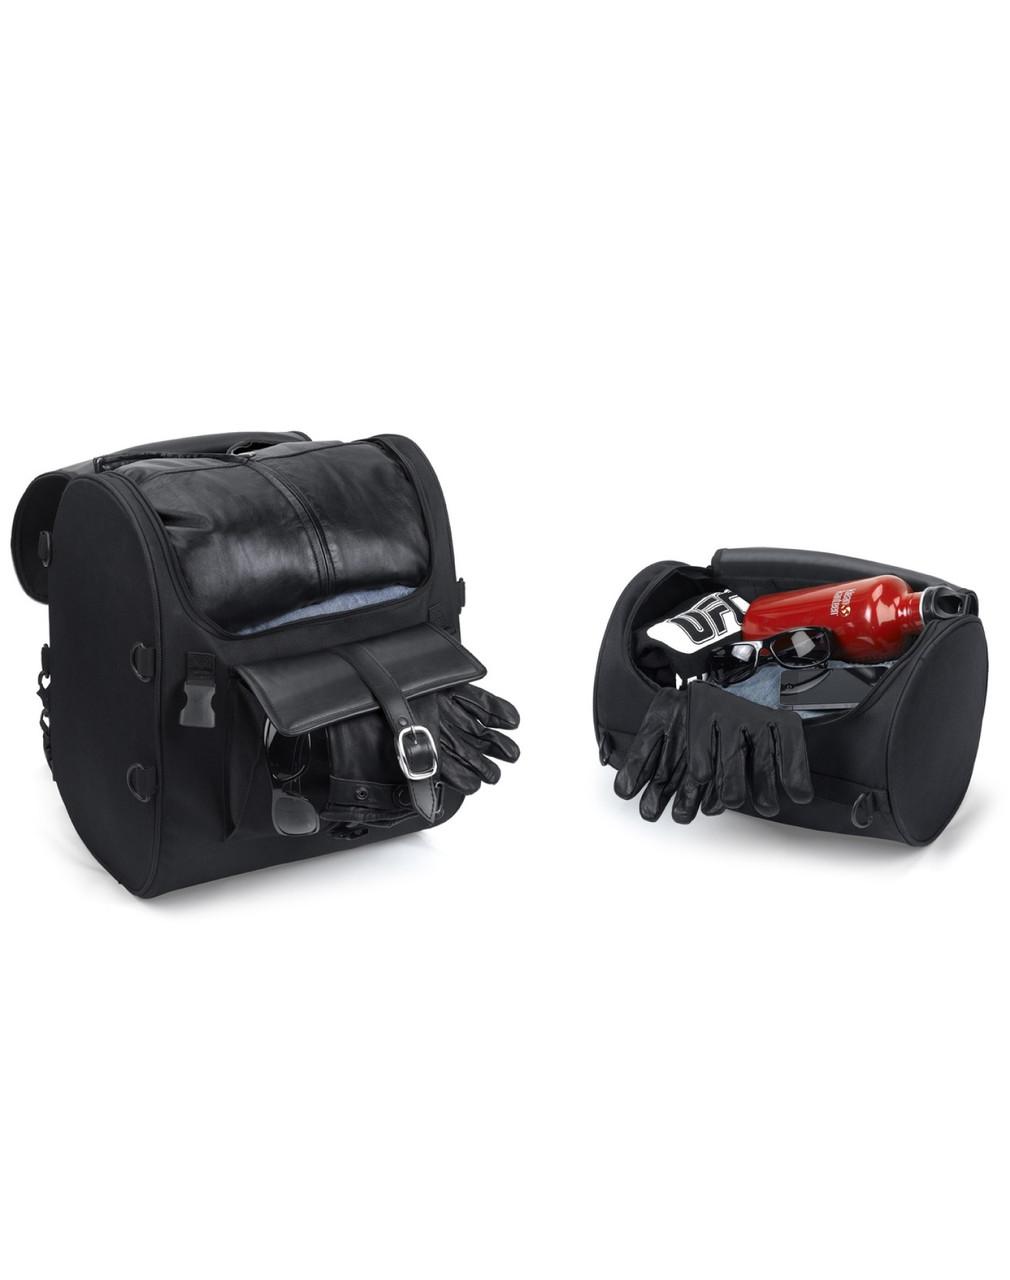 Yamaha Economy Line Motorcycle Sissy Bar Bag Storage View